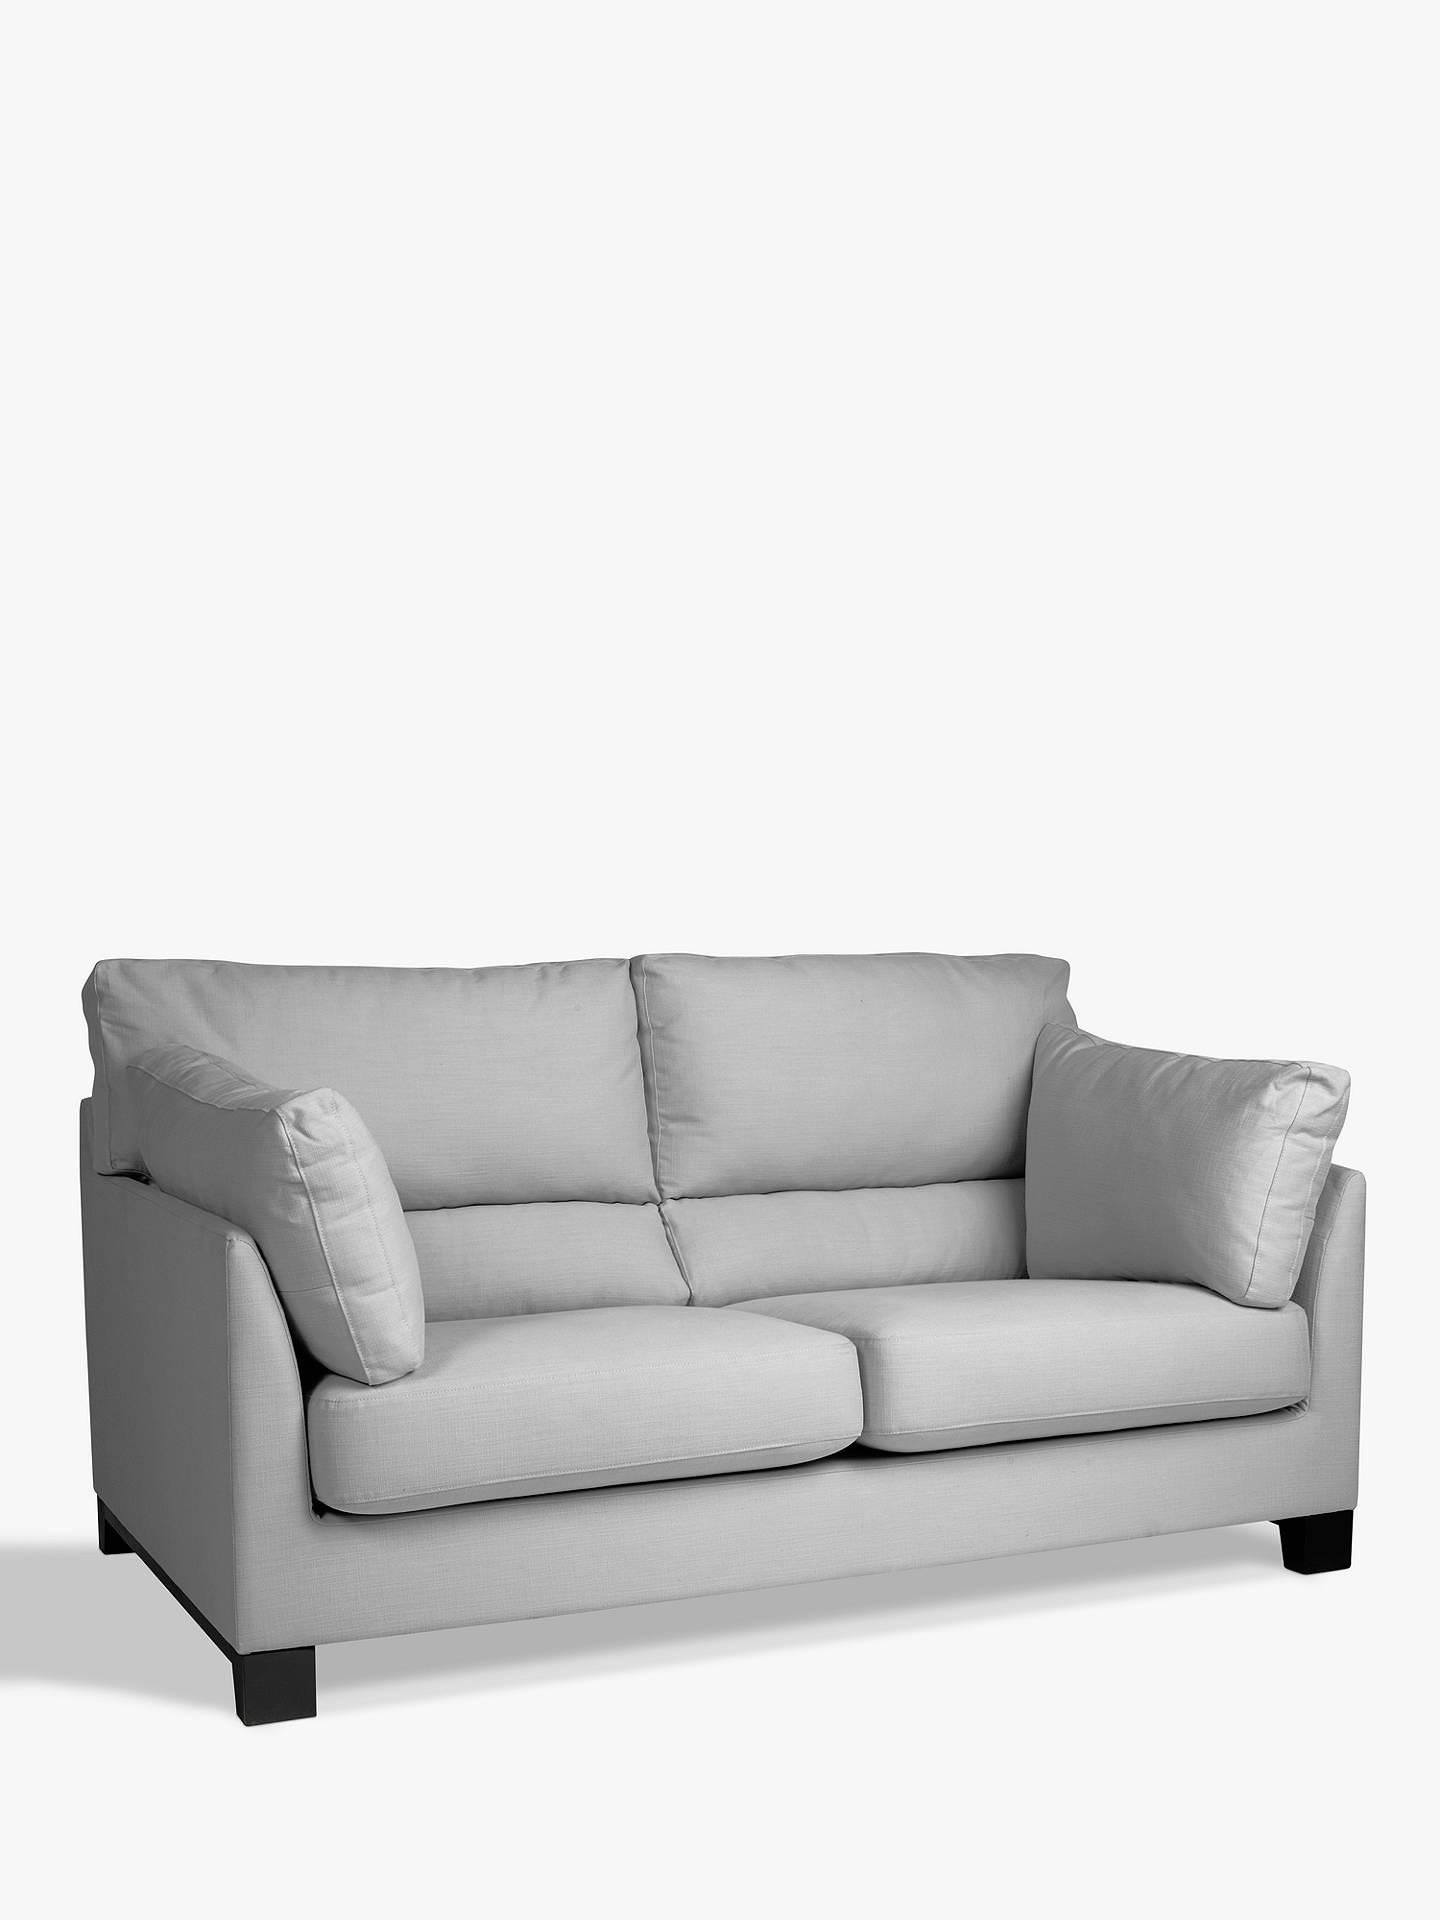 John Lewis & Partners Ikon High Back Grand 4 Seater Sofa